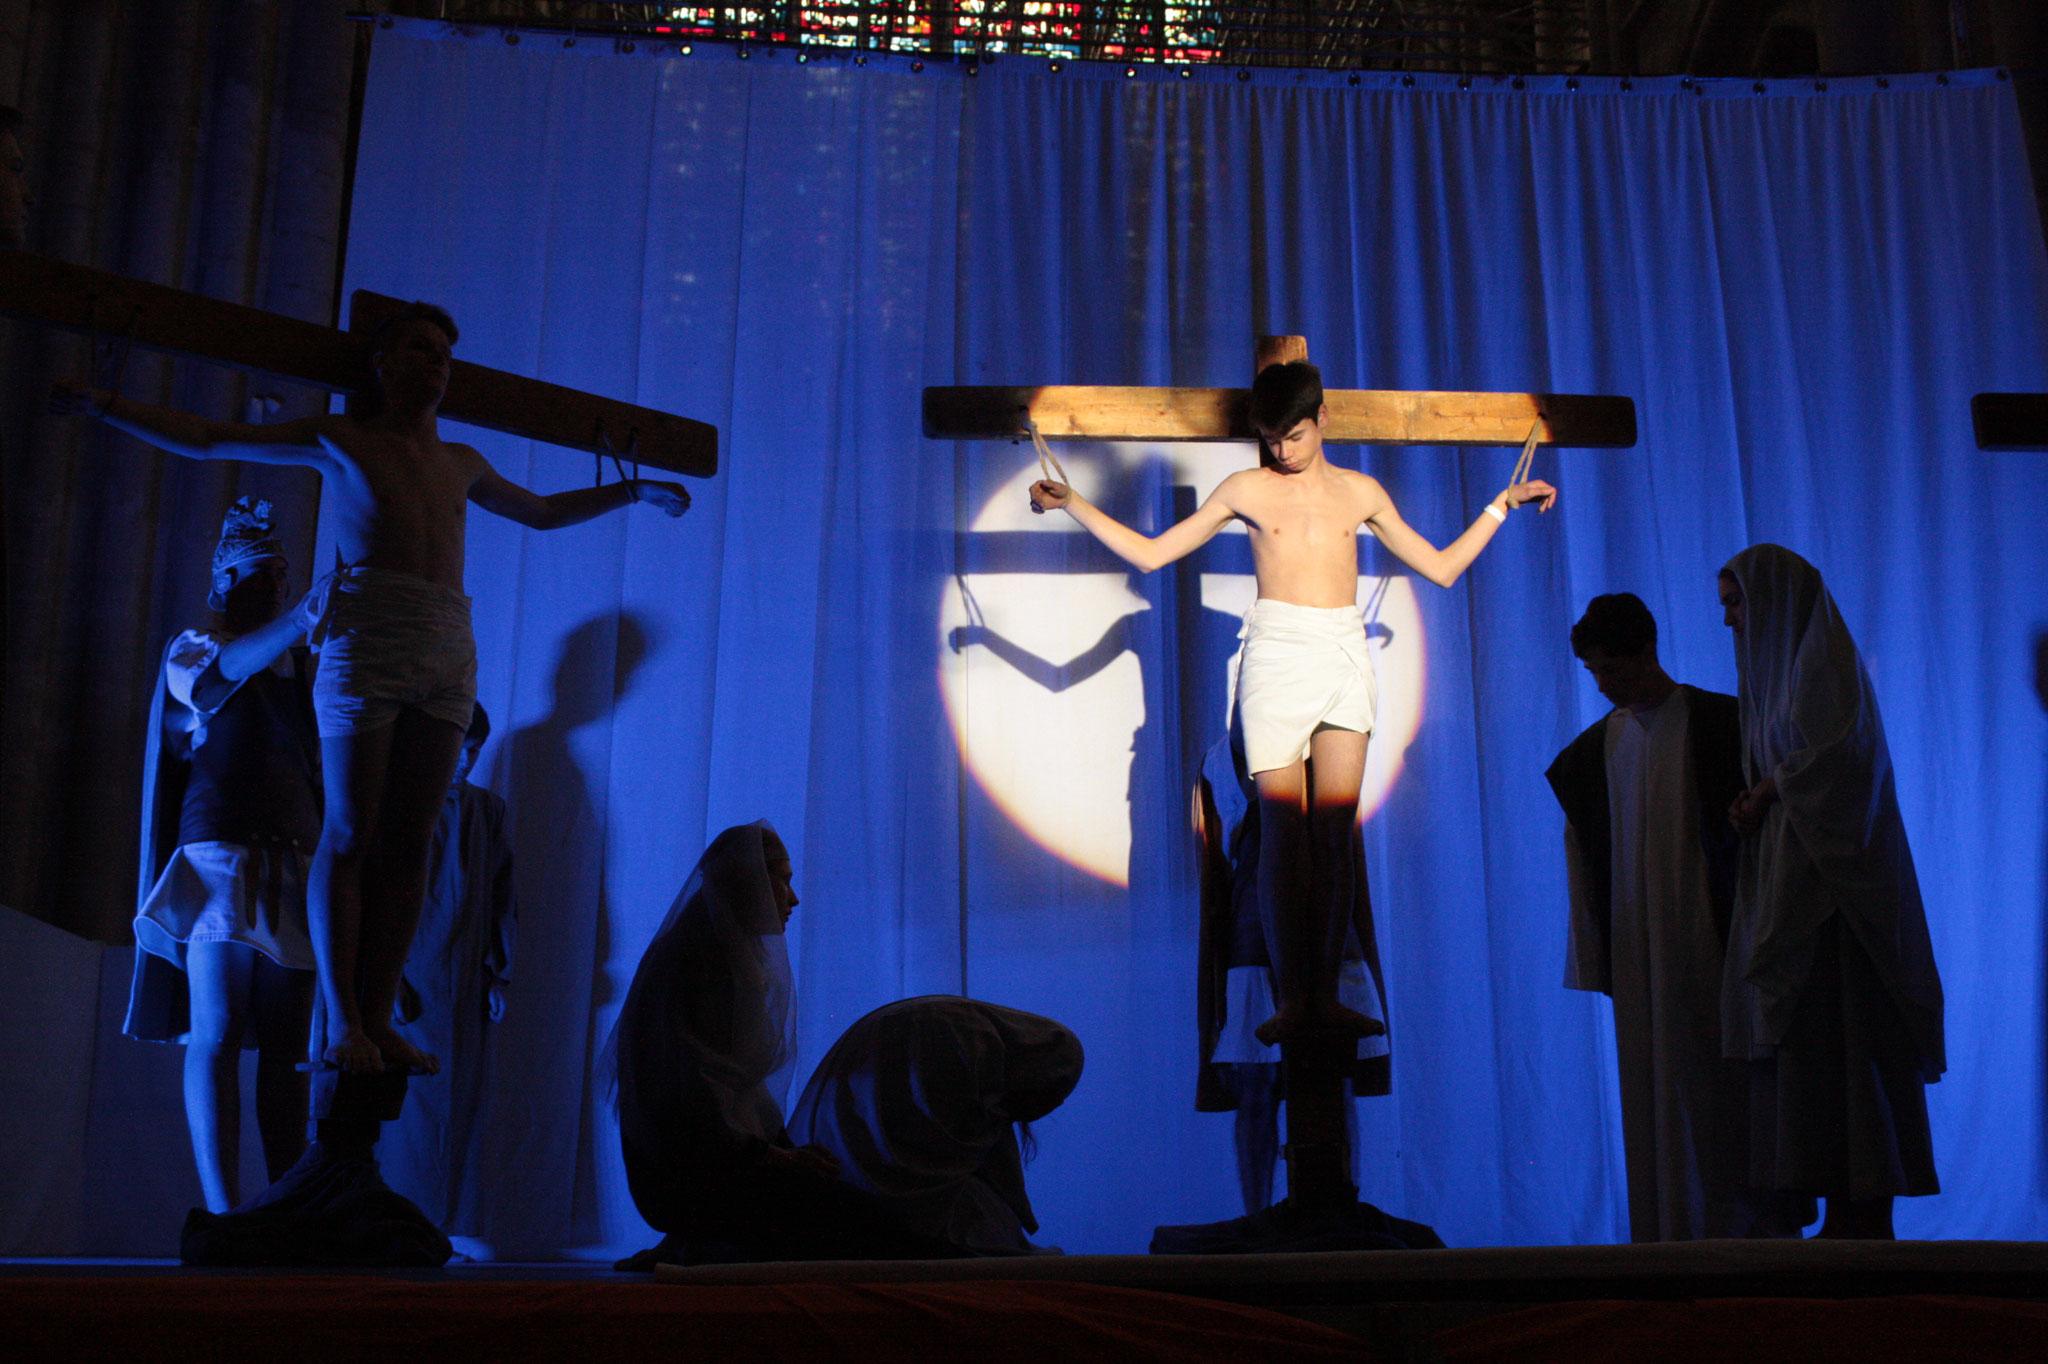 La mort en croix - (c) JDR